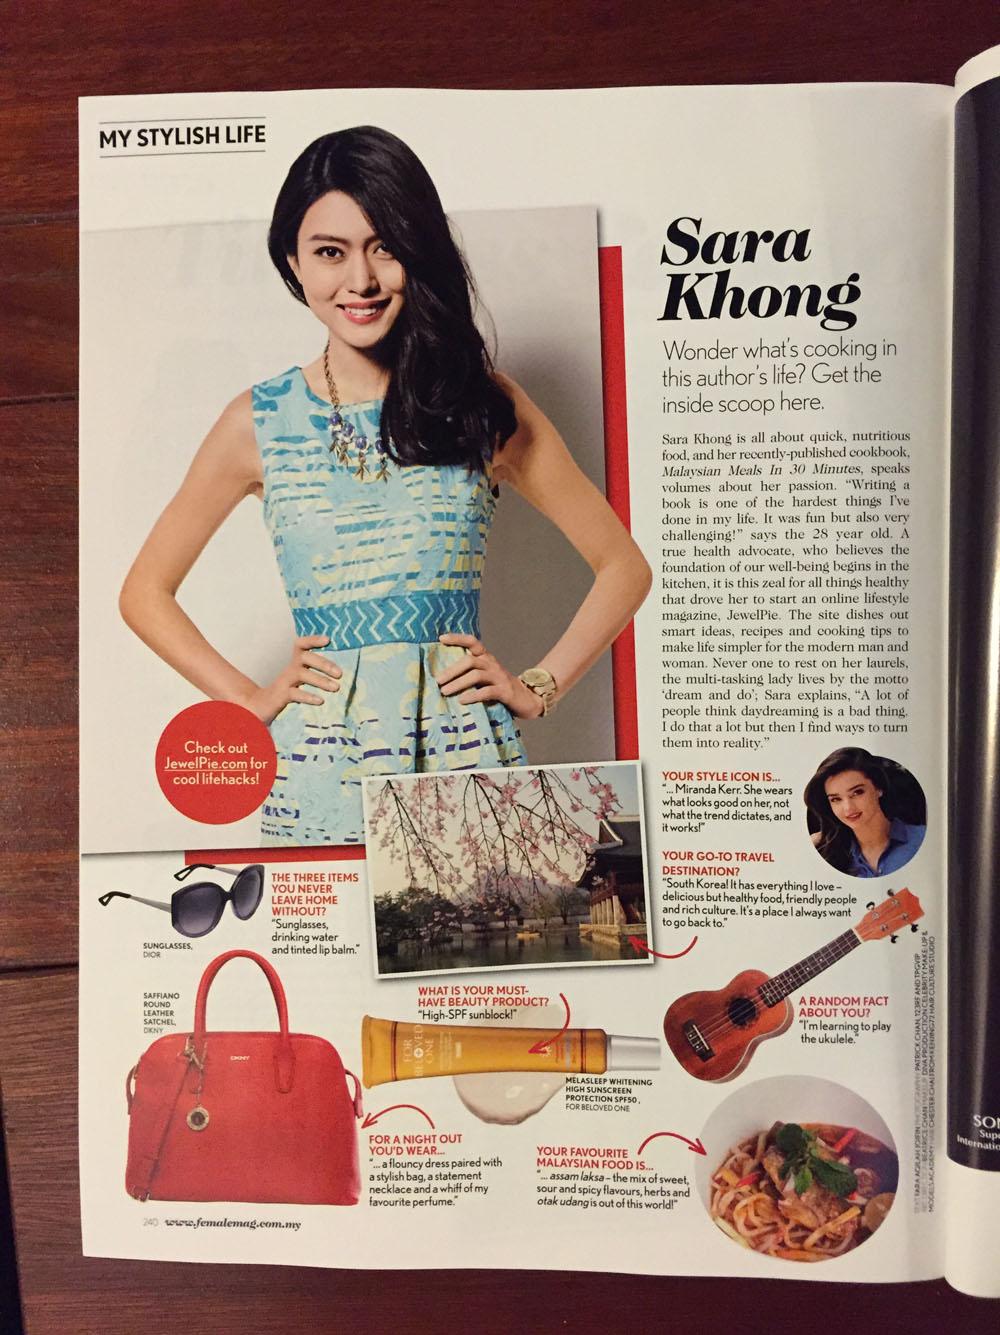 Female Magazine Malaysia - Sara Khong 2